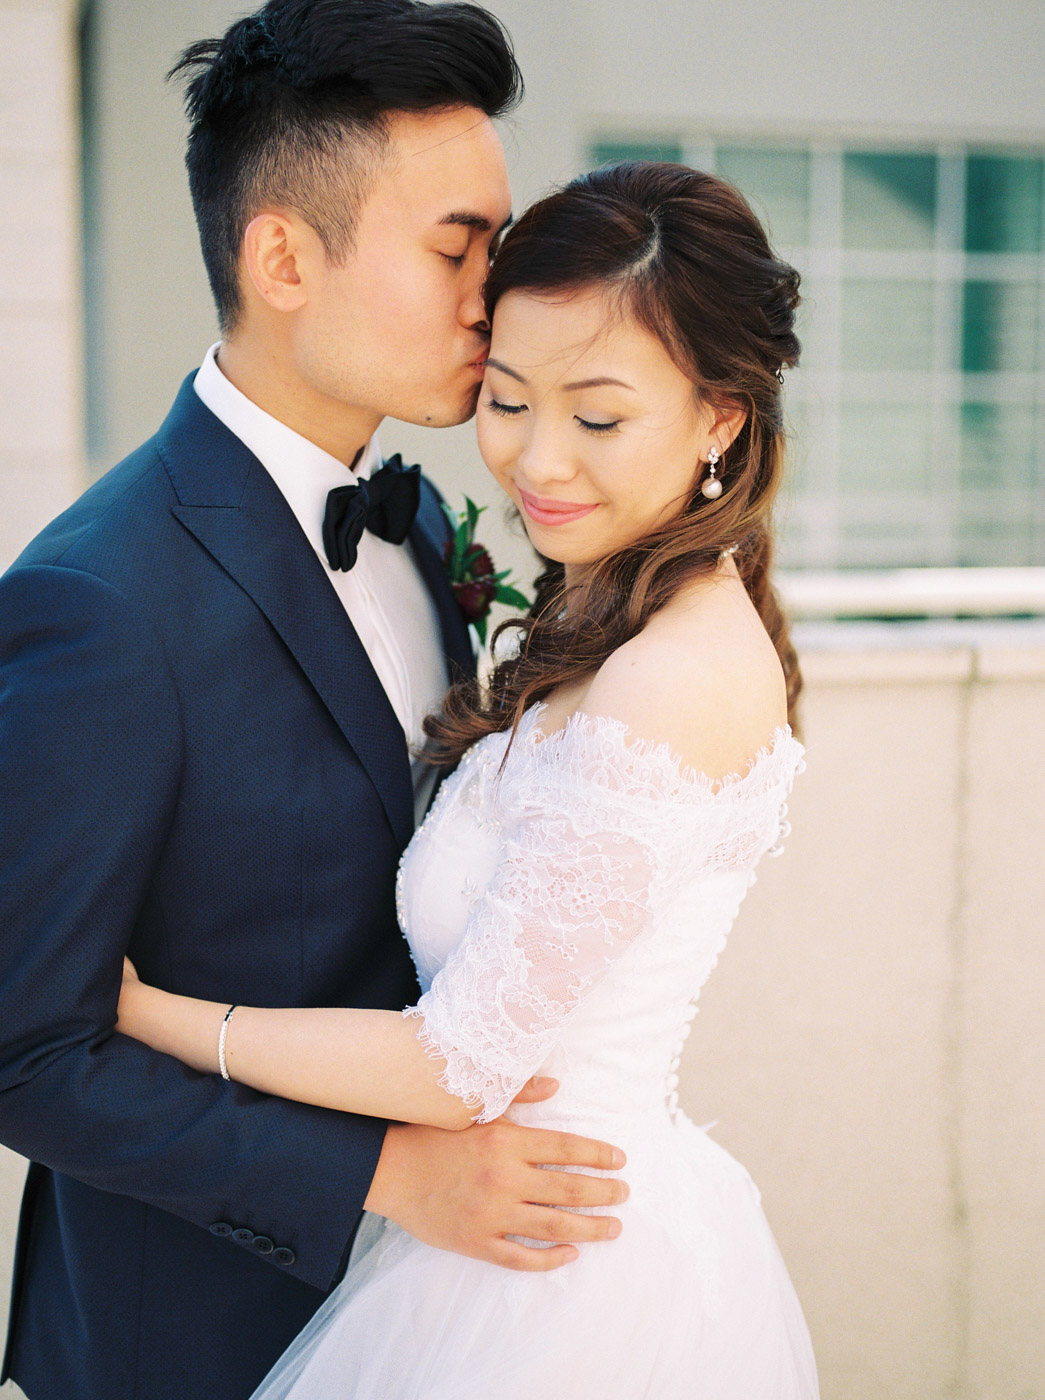 toronto_wedding_photographer_documentary_fine_art_photography-29.jpg